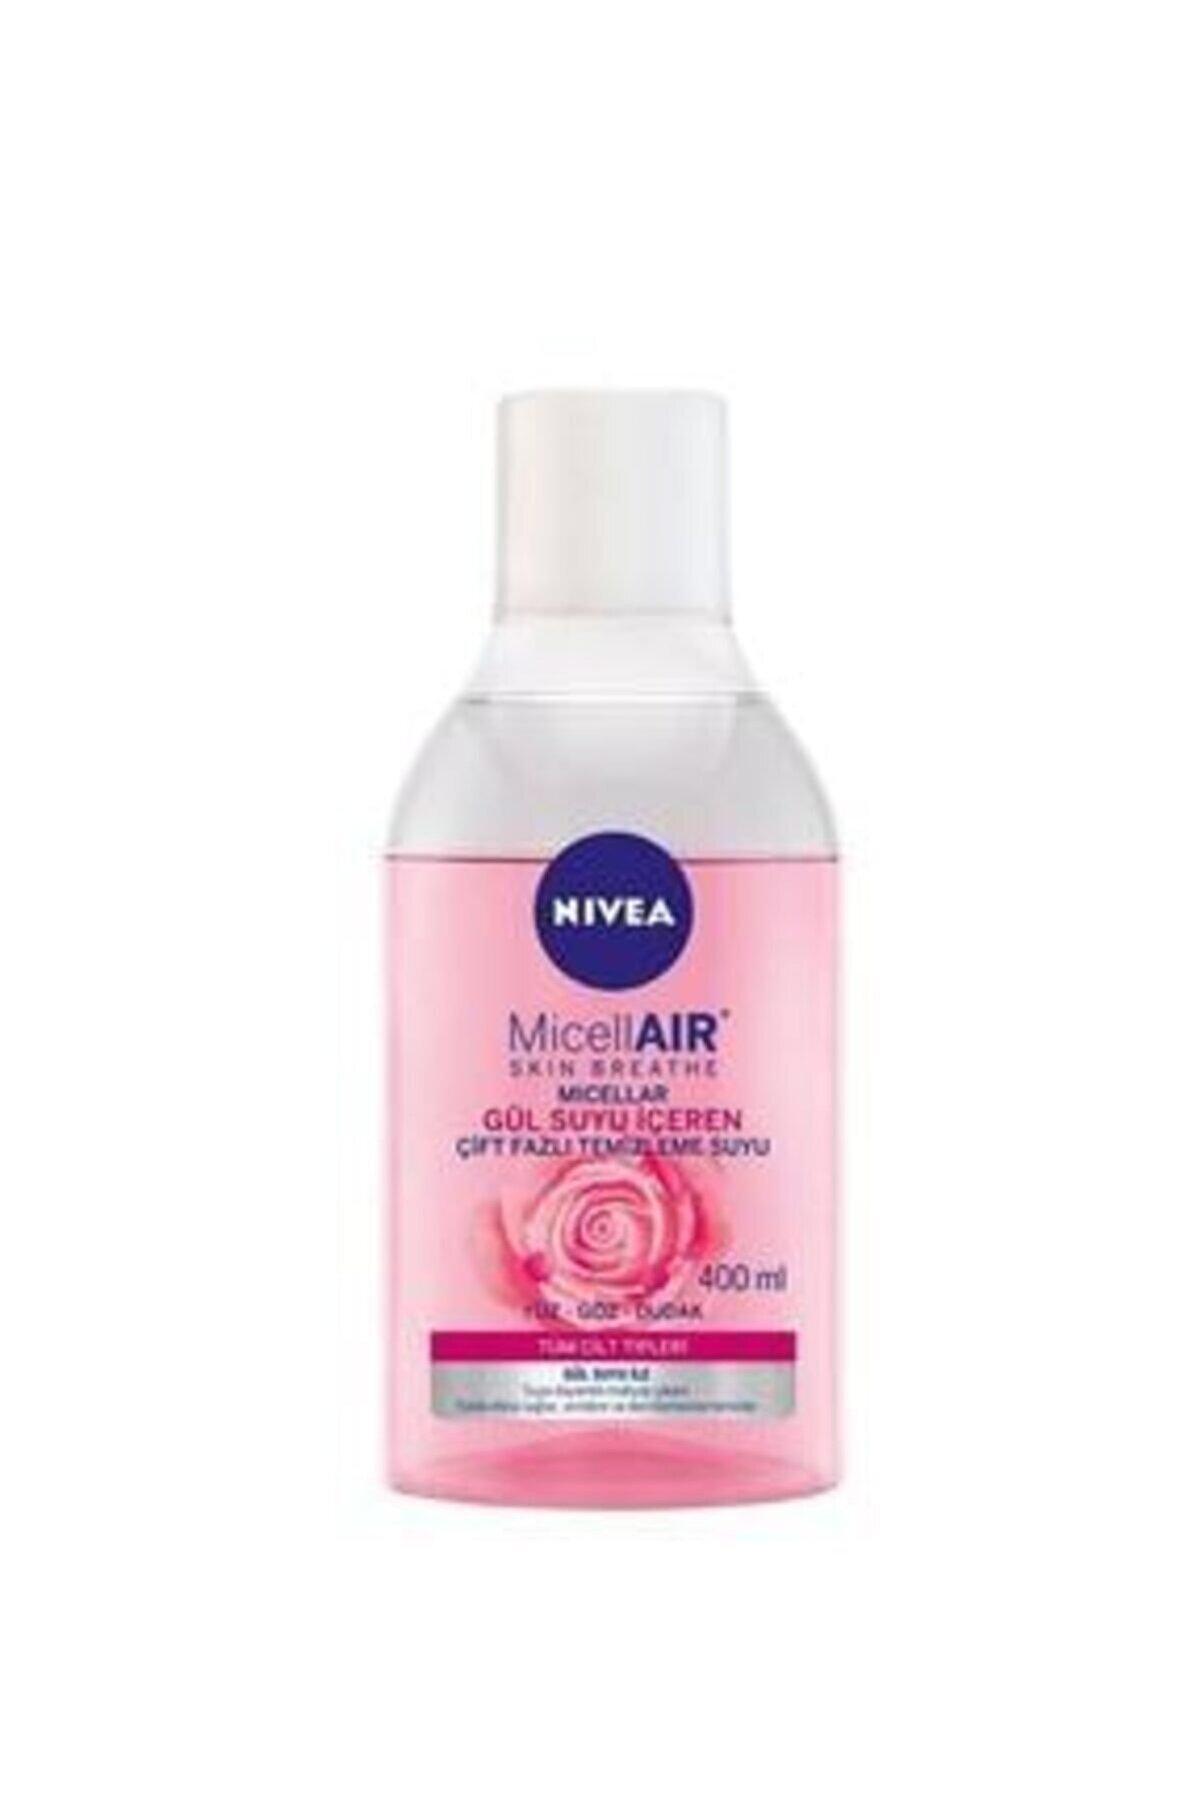 Nivea Rose Çift Fazli Makyaj Temizleme Suyu